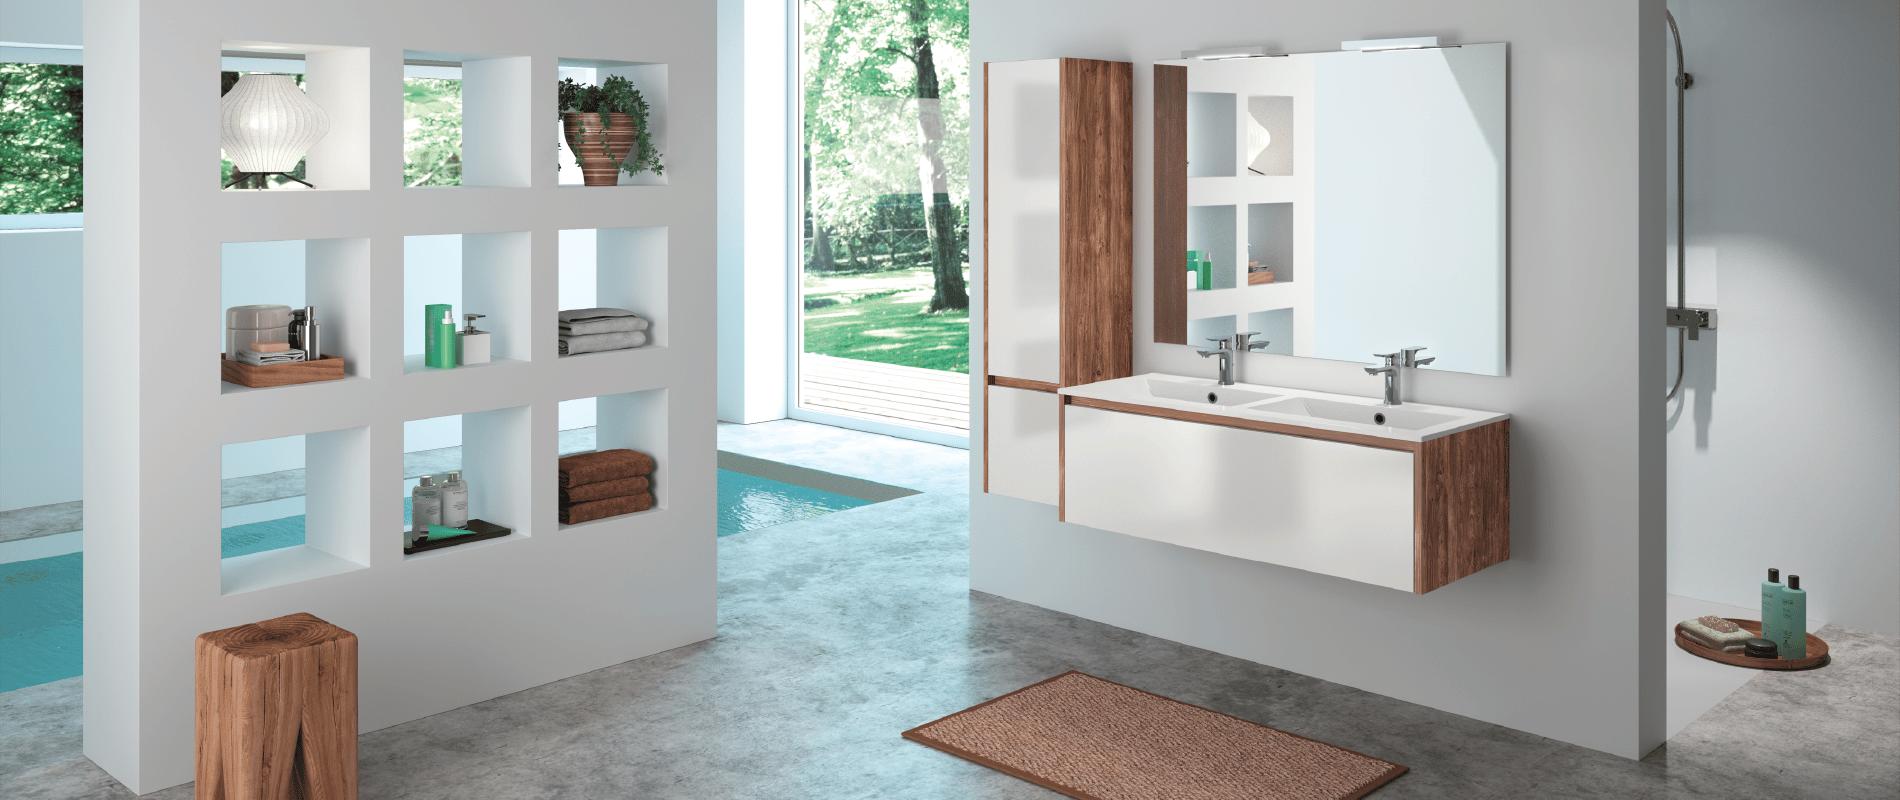 Salle de bain haut de gamme meubles sur mesure marque for Meuble de qualite